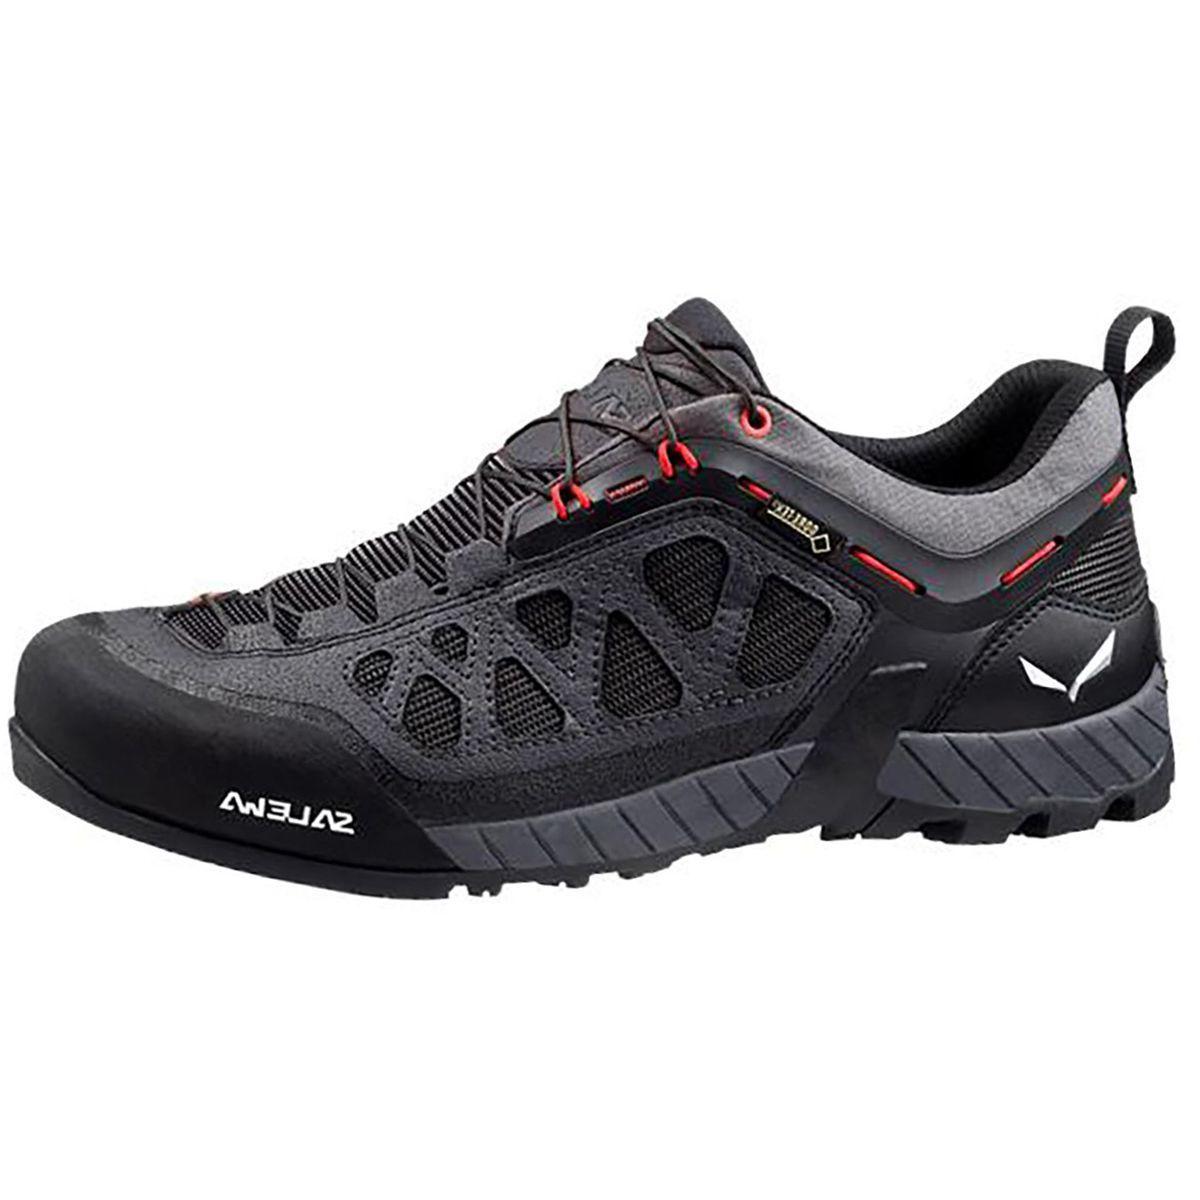 Salewa Firetail 3 GTX Approach Shoe - Men's